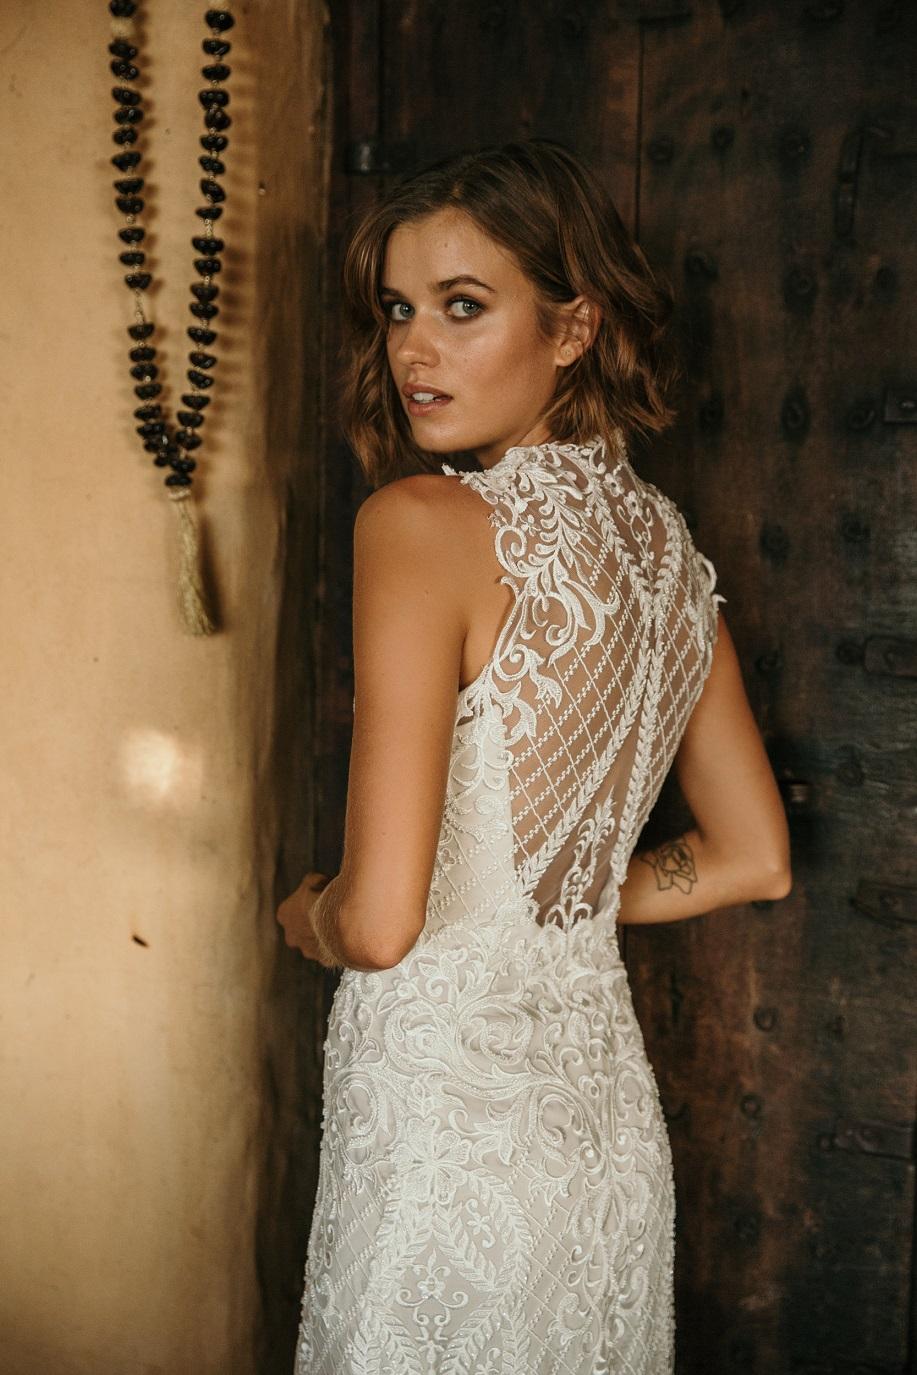 Breathless wedding dress by Jennifer Go featured on LOVE FIND CO.